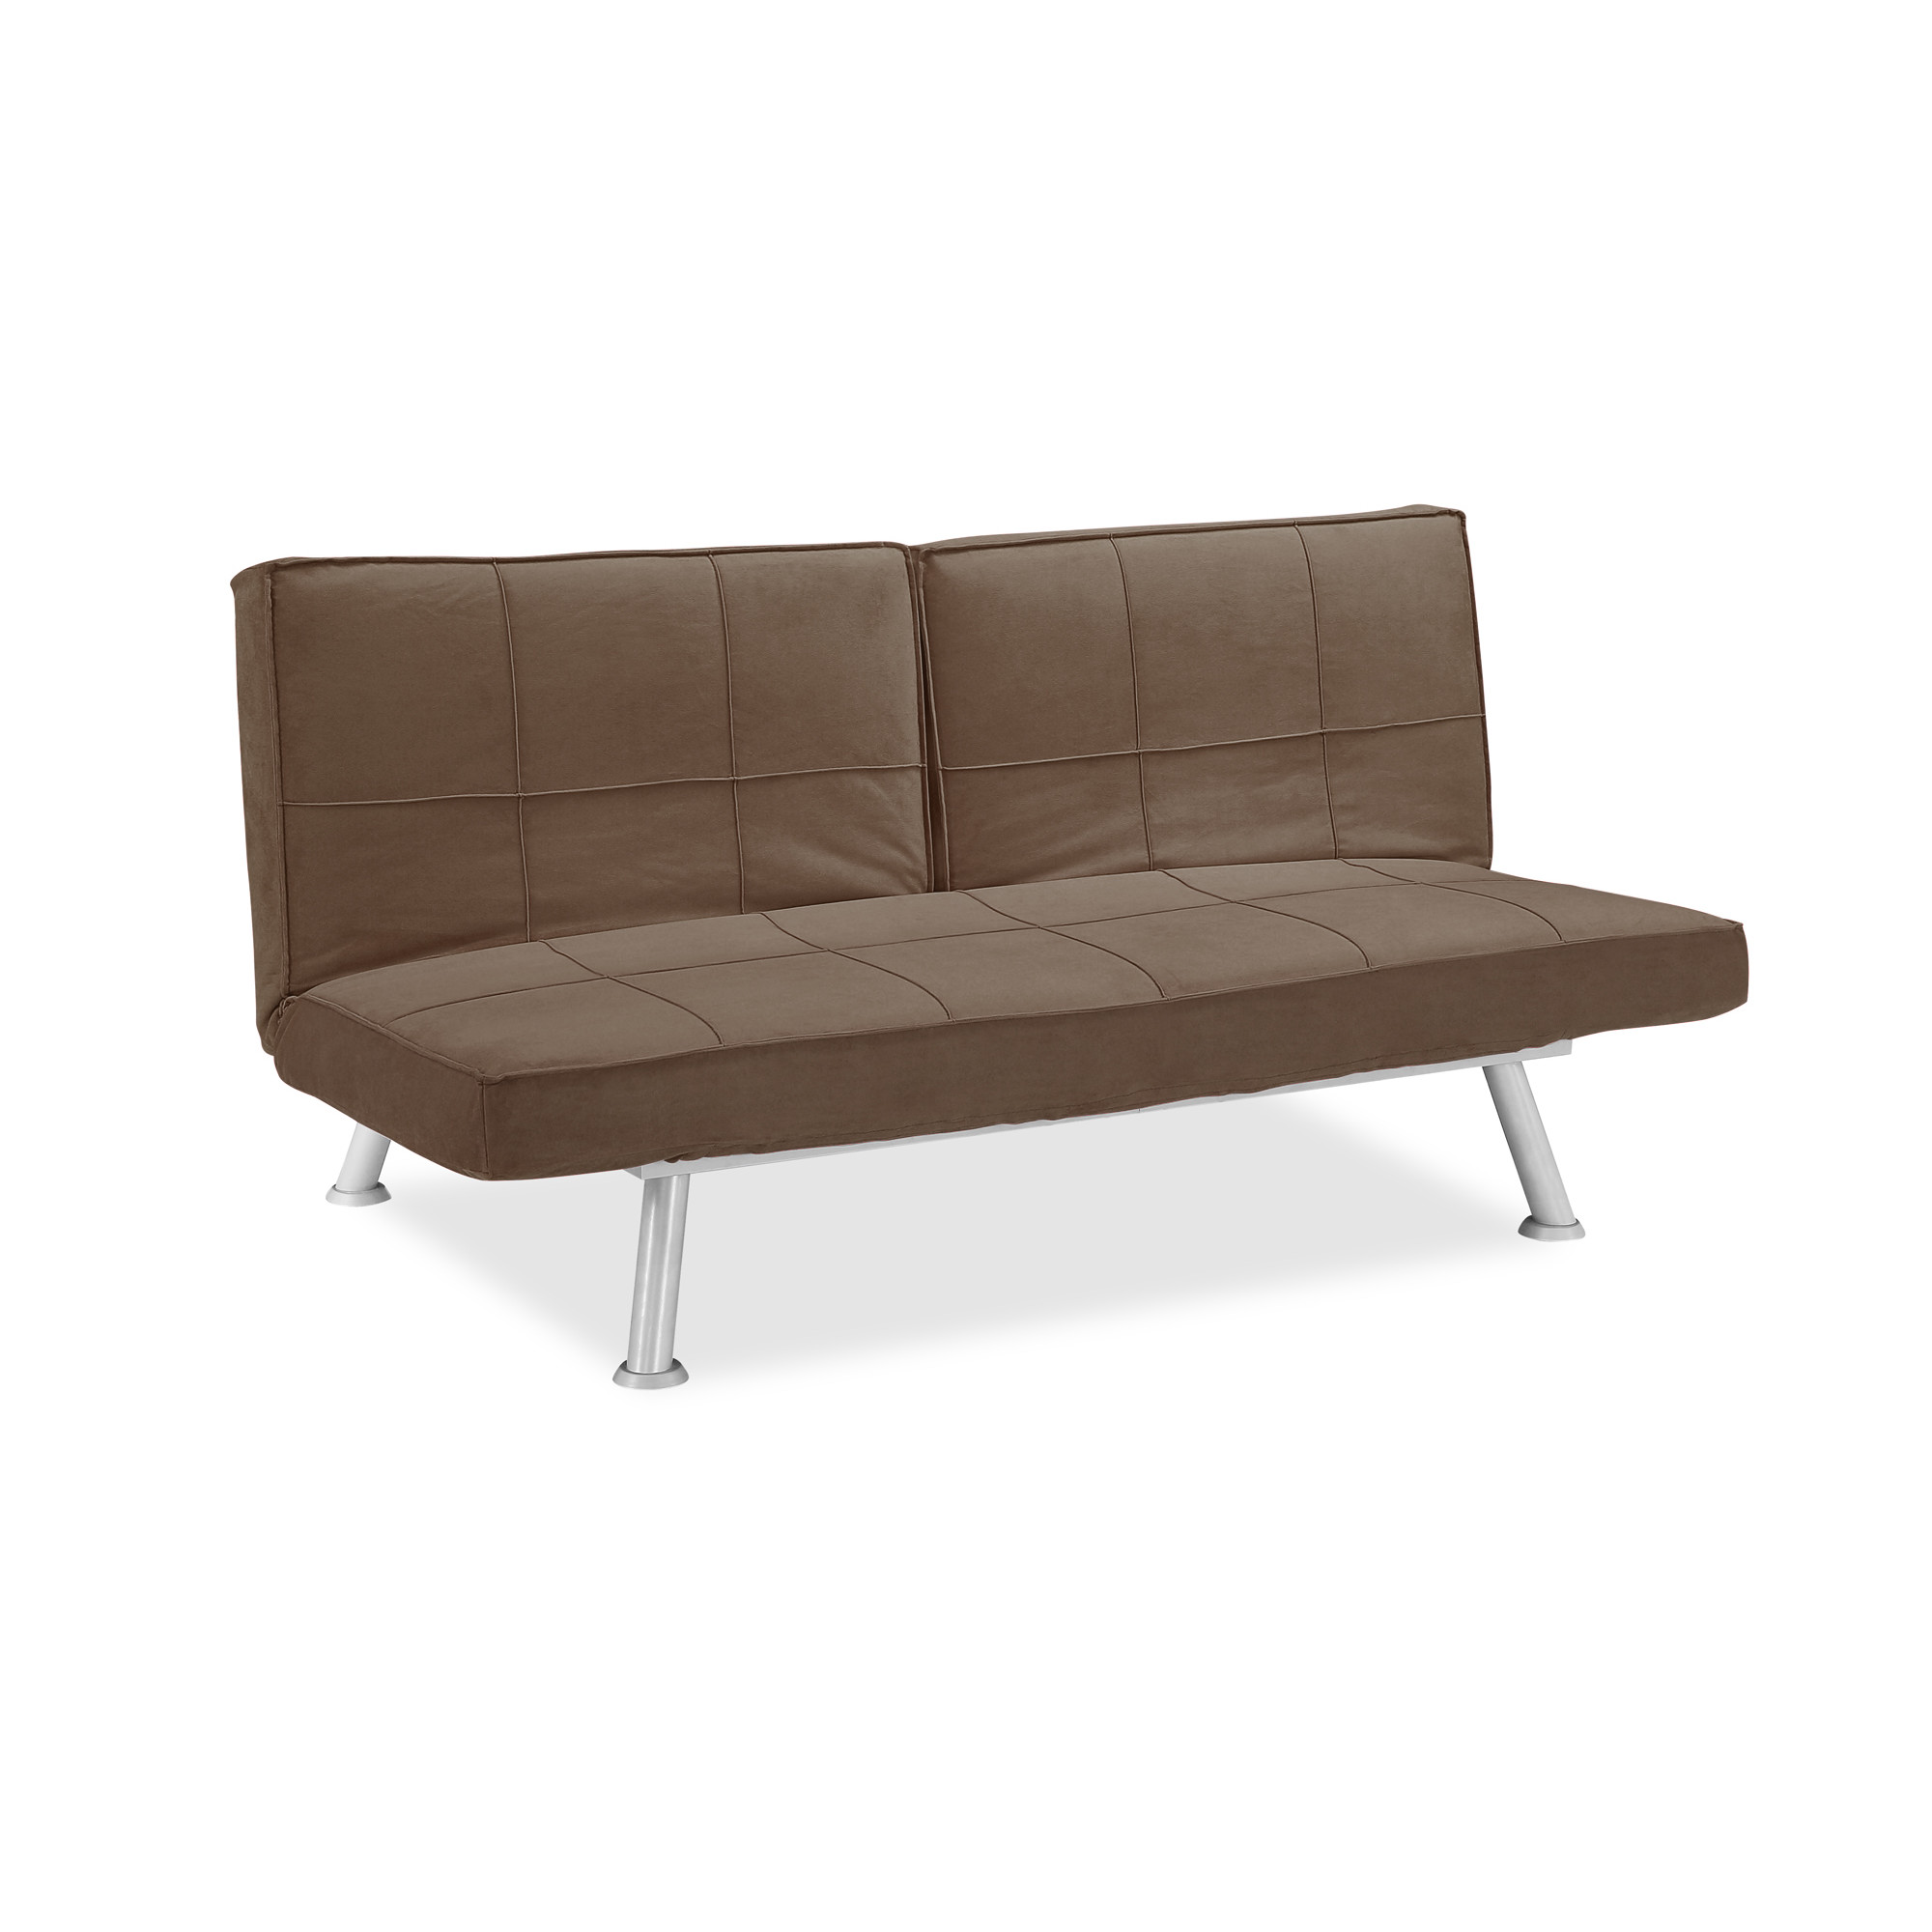 Maxson Convertible Sofa Java By Serta Lifestyle